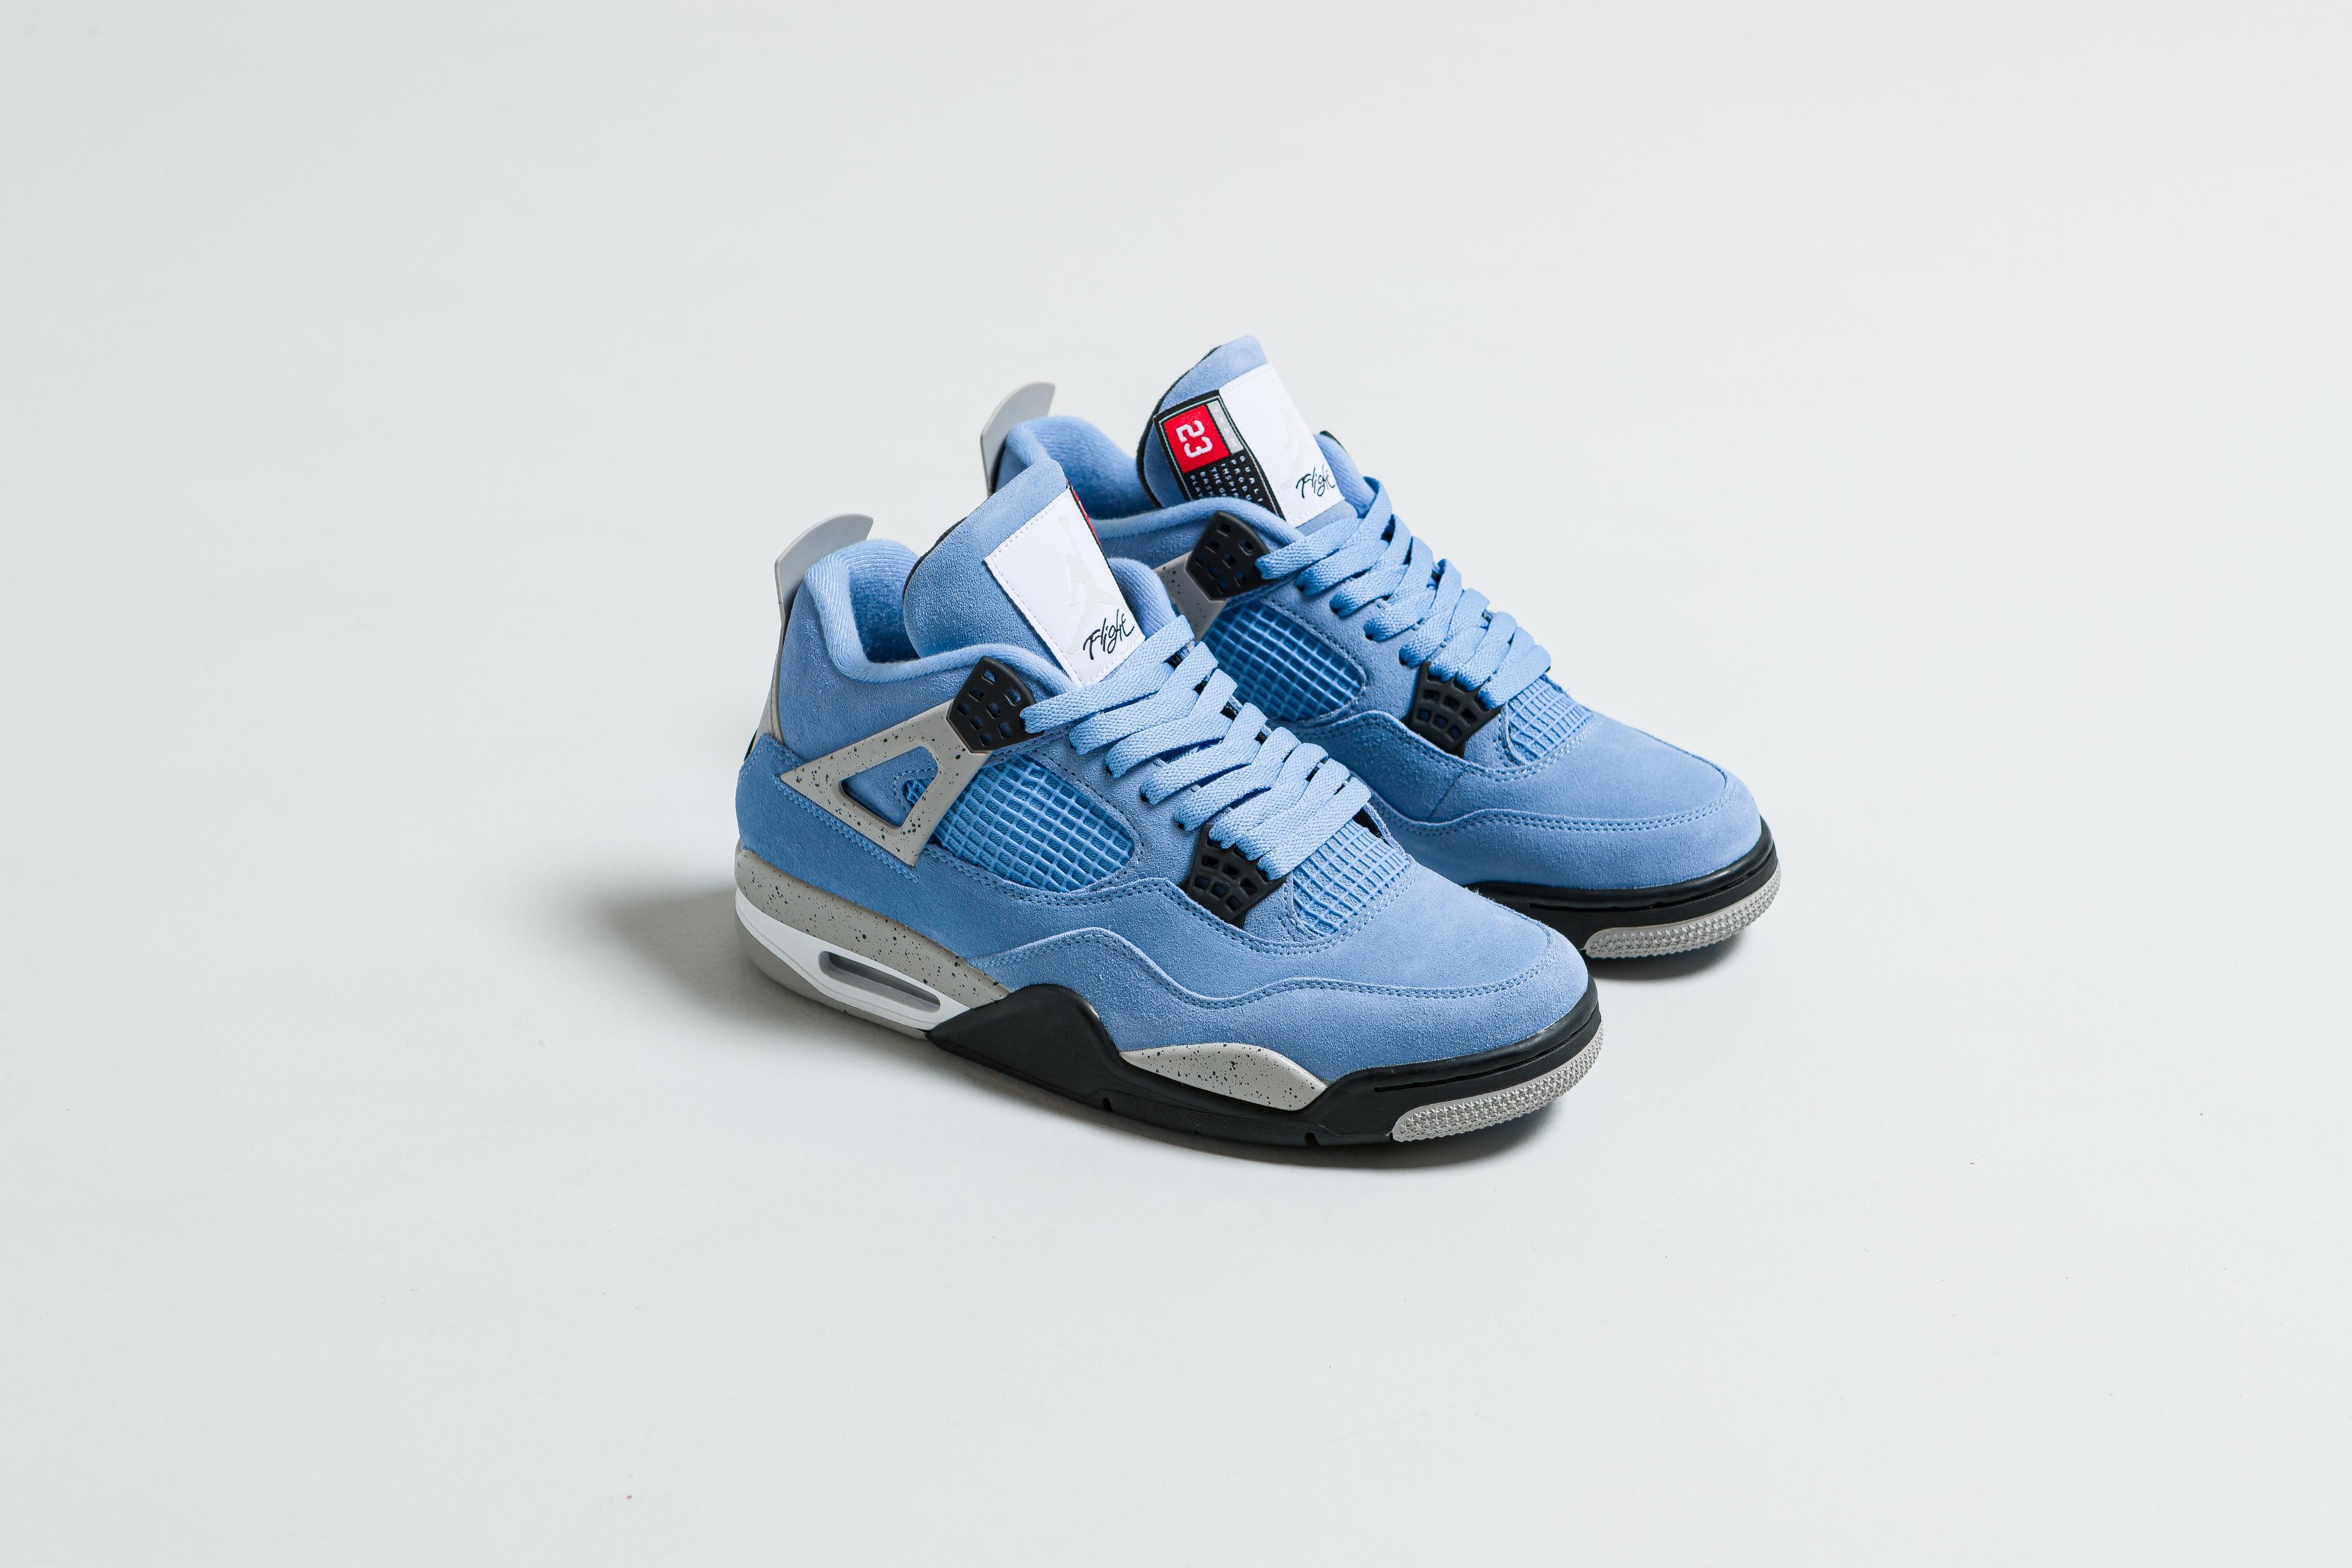 Jordan - Air Jordan 4 Retro - University Blue/Black-Tech Grey-White - Up There